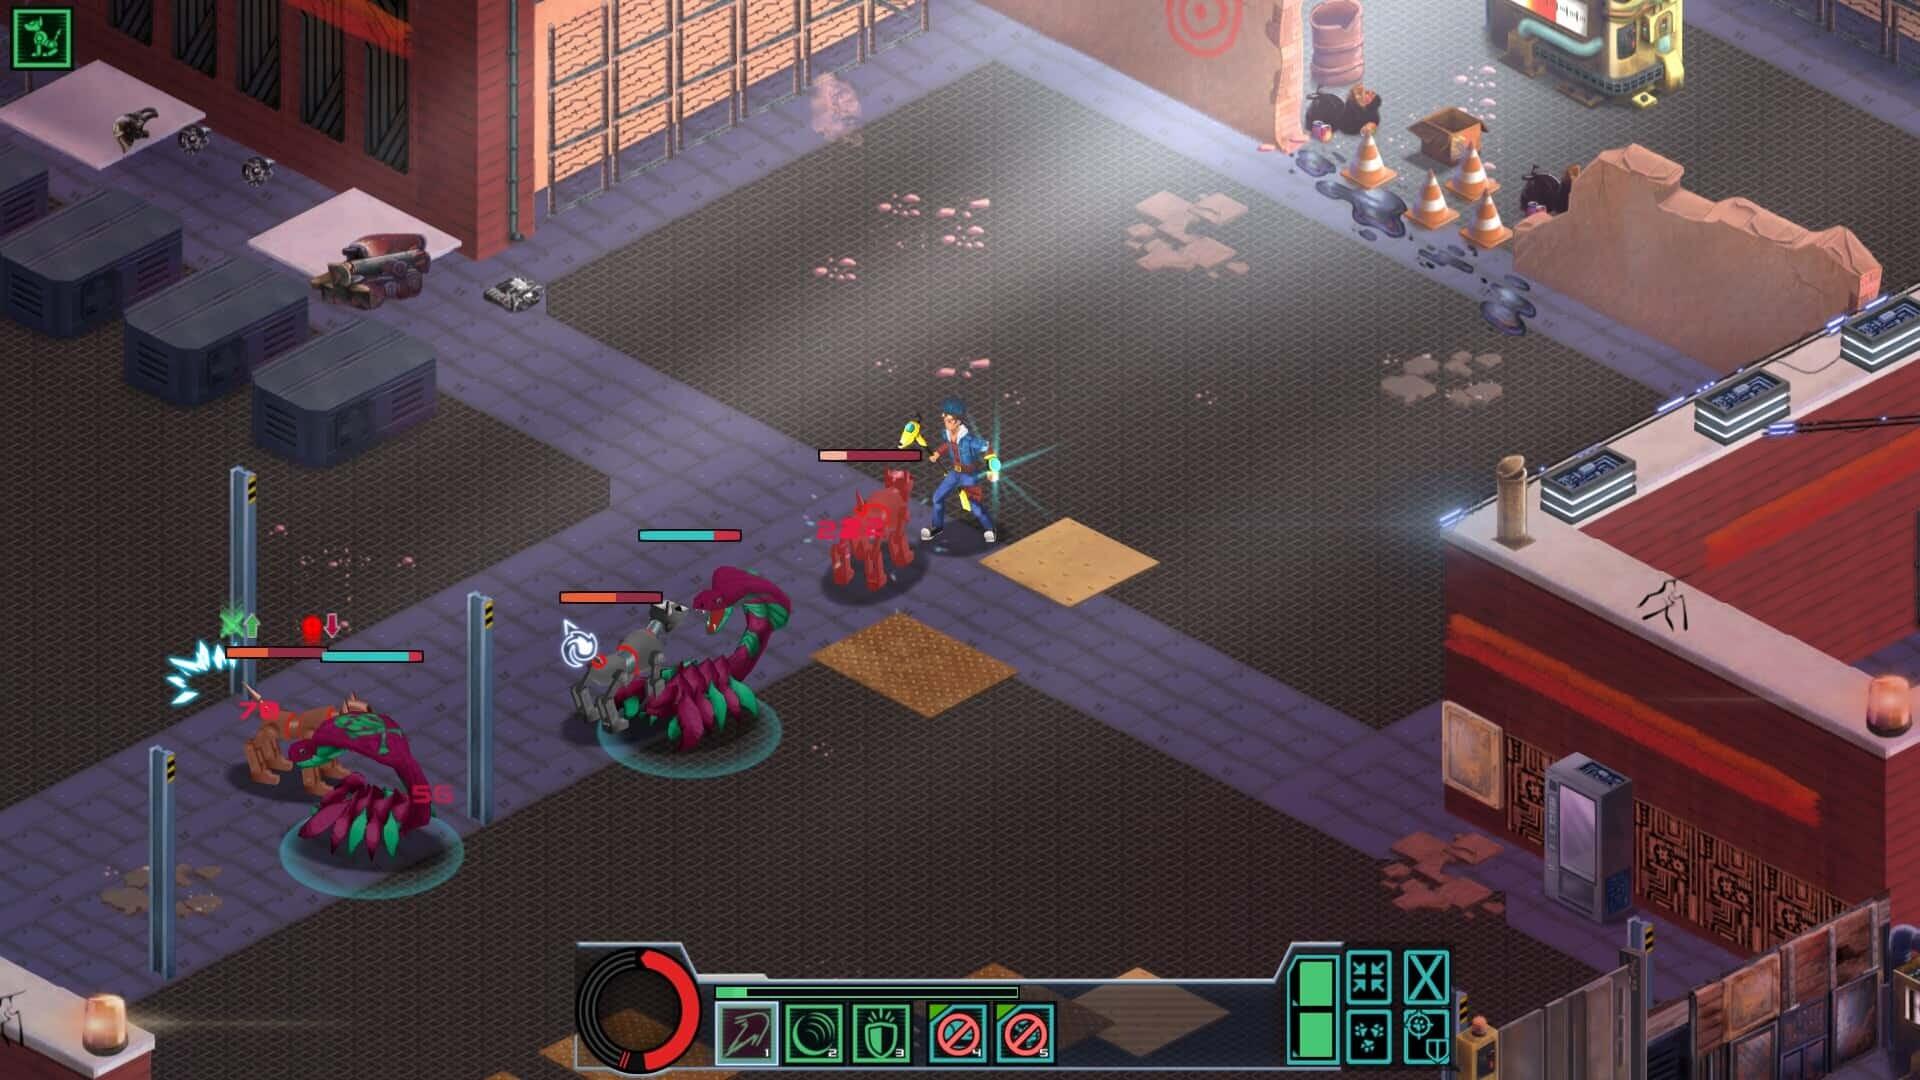 Megamagic game screenshot 6